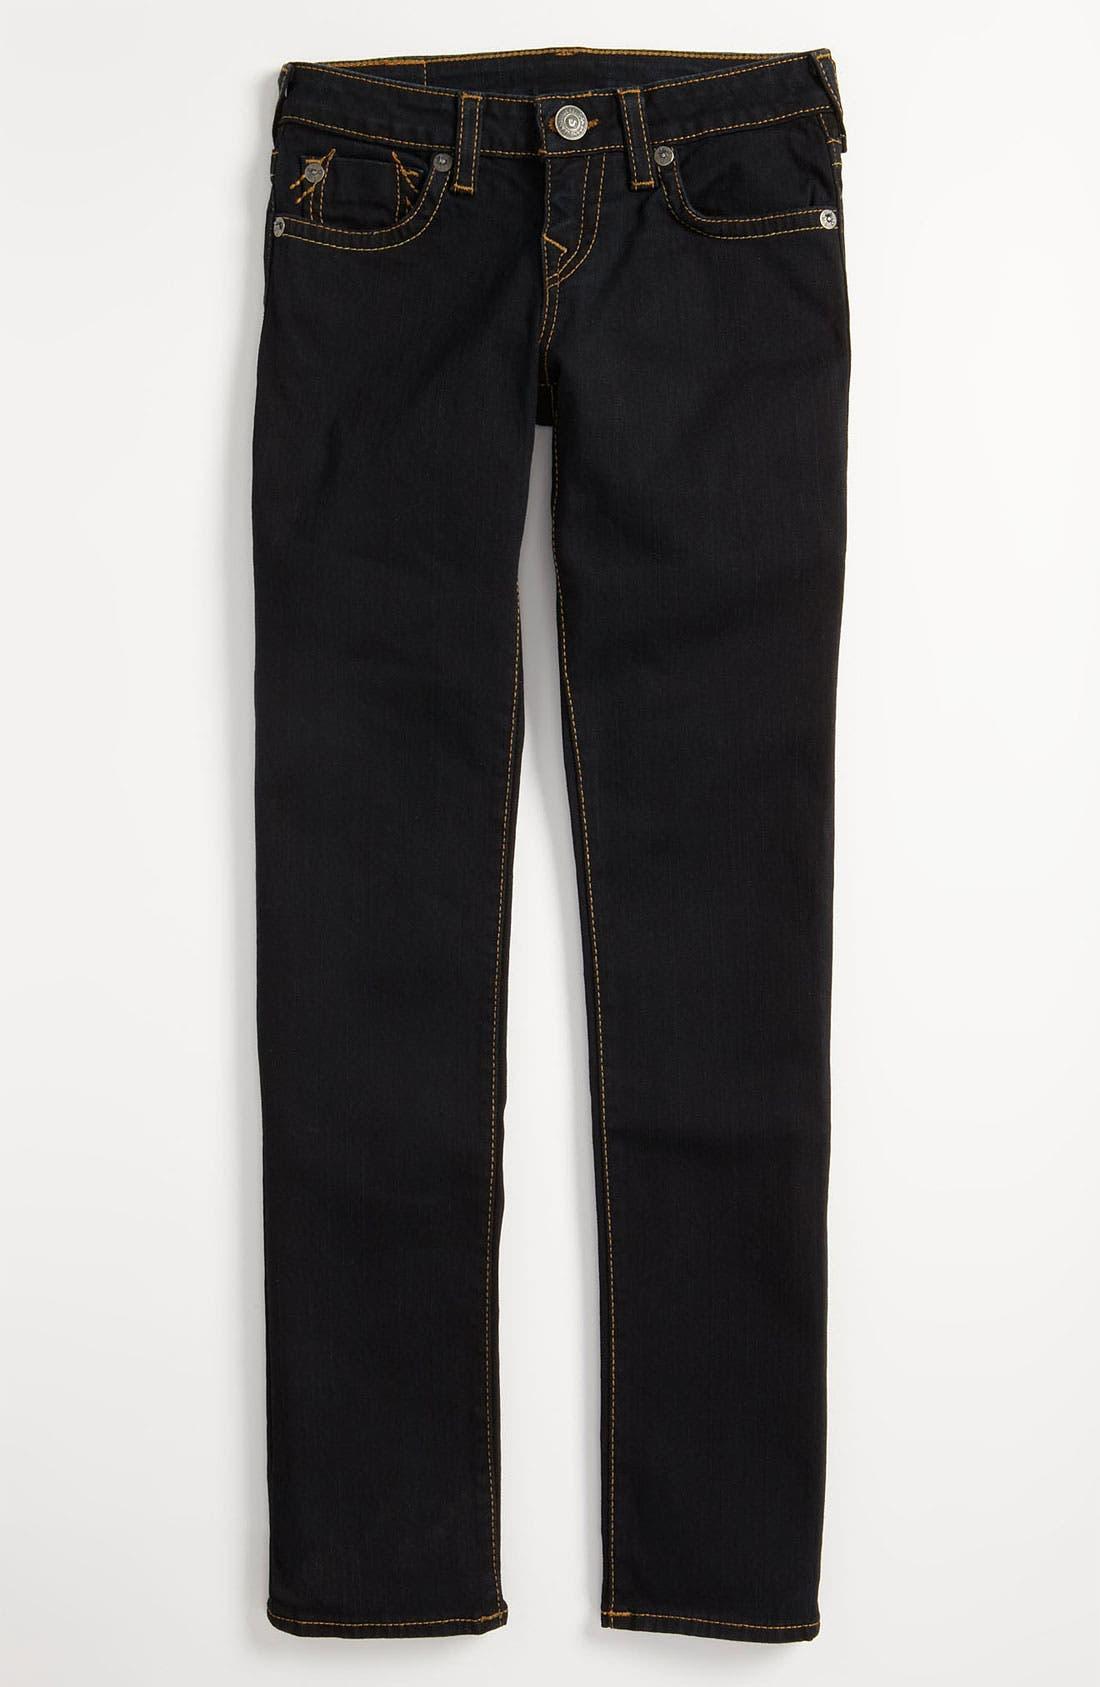 Alternate Image 2  - True Religion Brand Jeans 'Stella' Skinny Jeans (Little Girls & Big Girls)